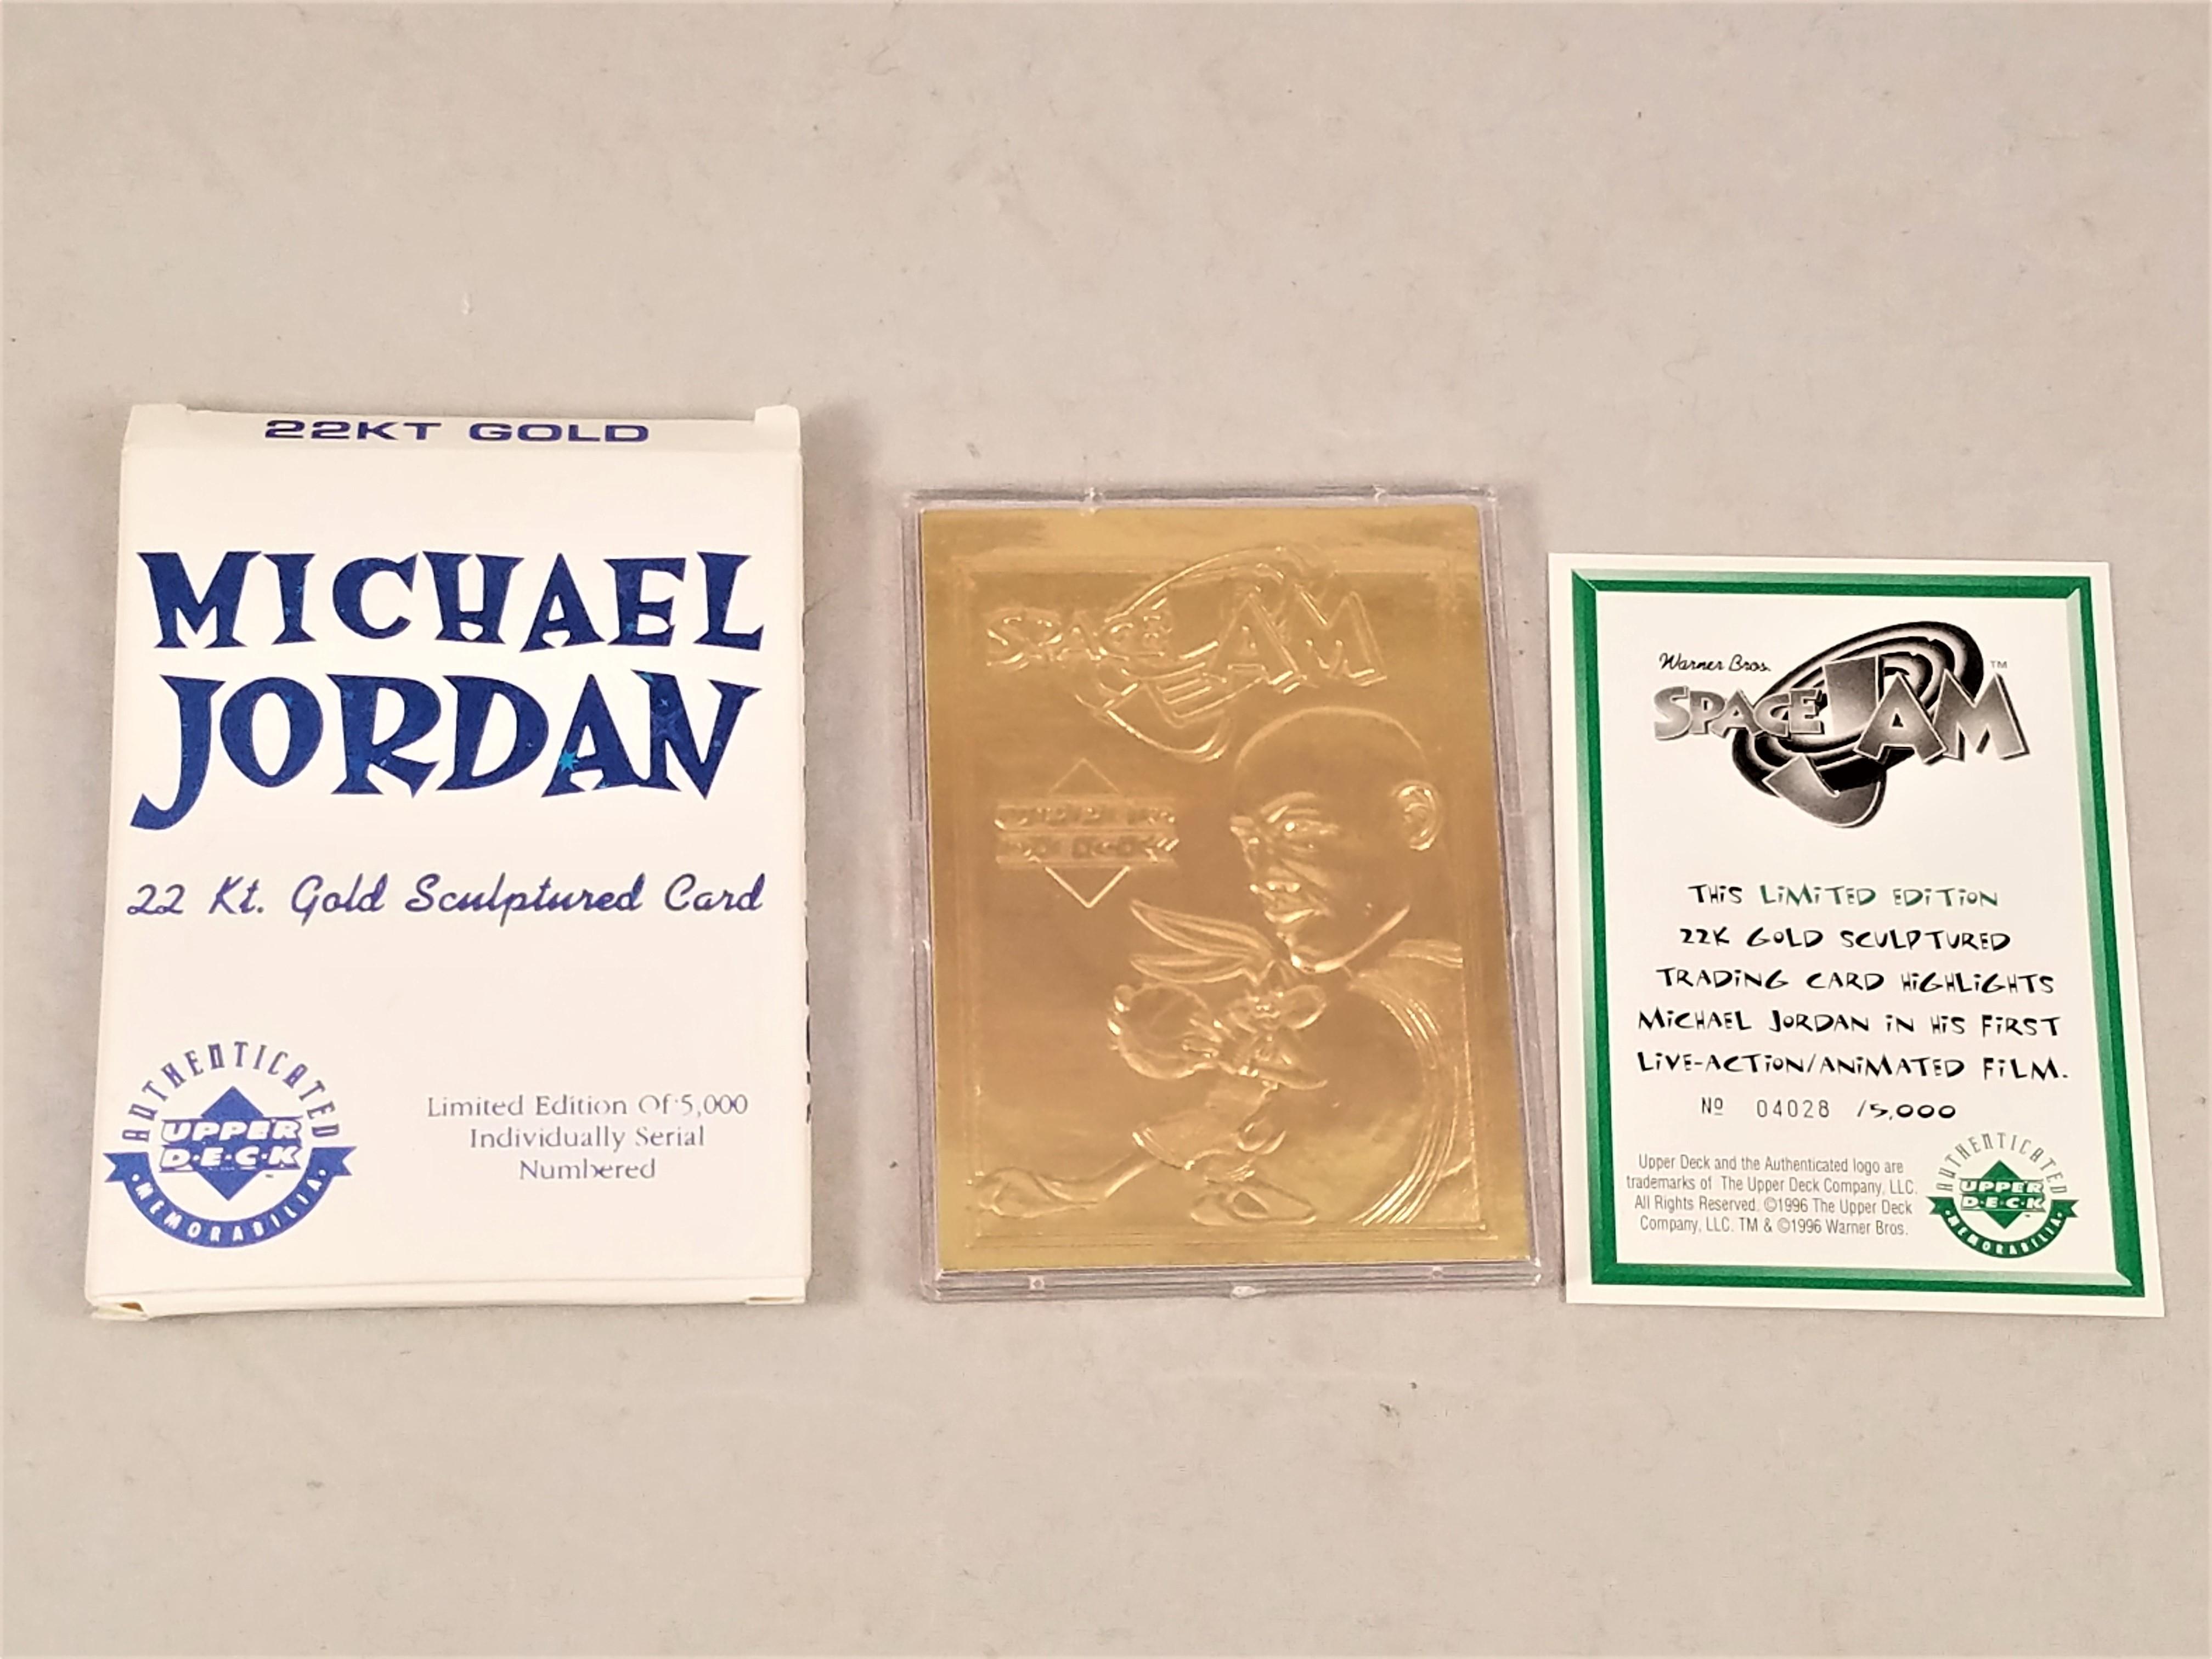 1996 Upper Deck Michael Jordan 22kt Gold Space Jam Card /5000 w/ Box & COA